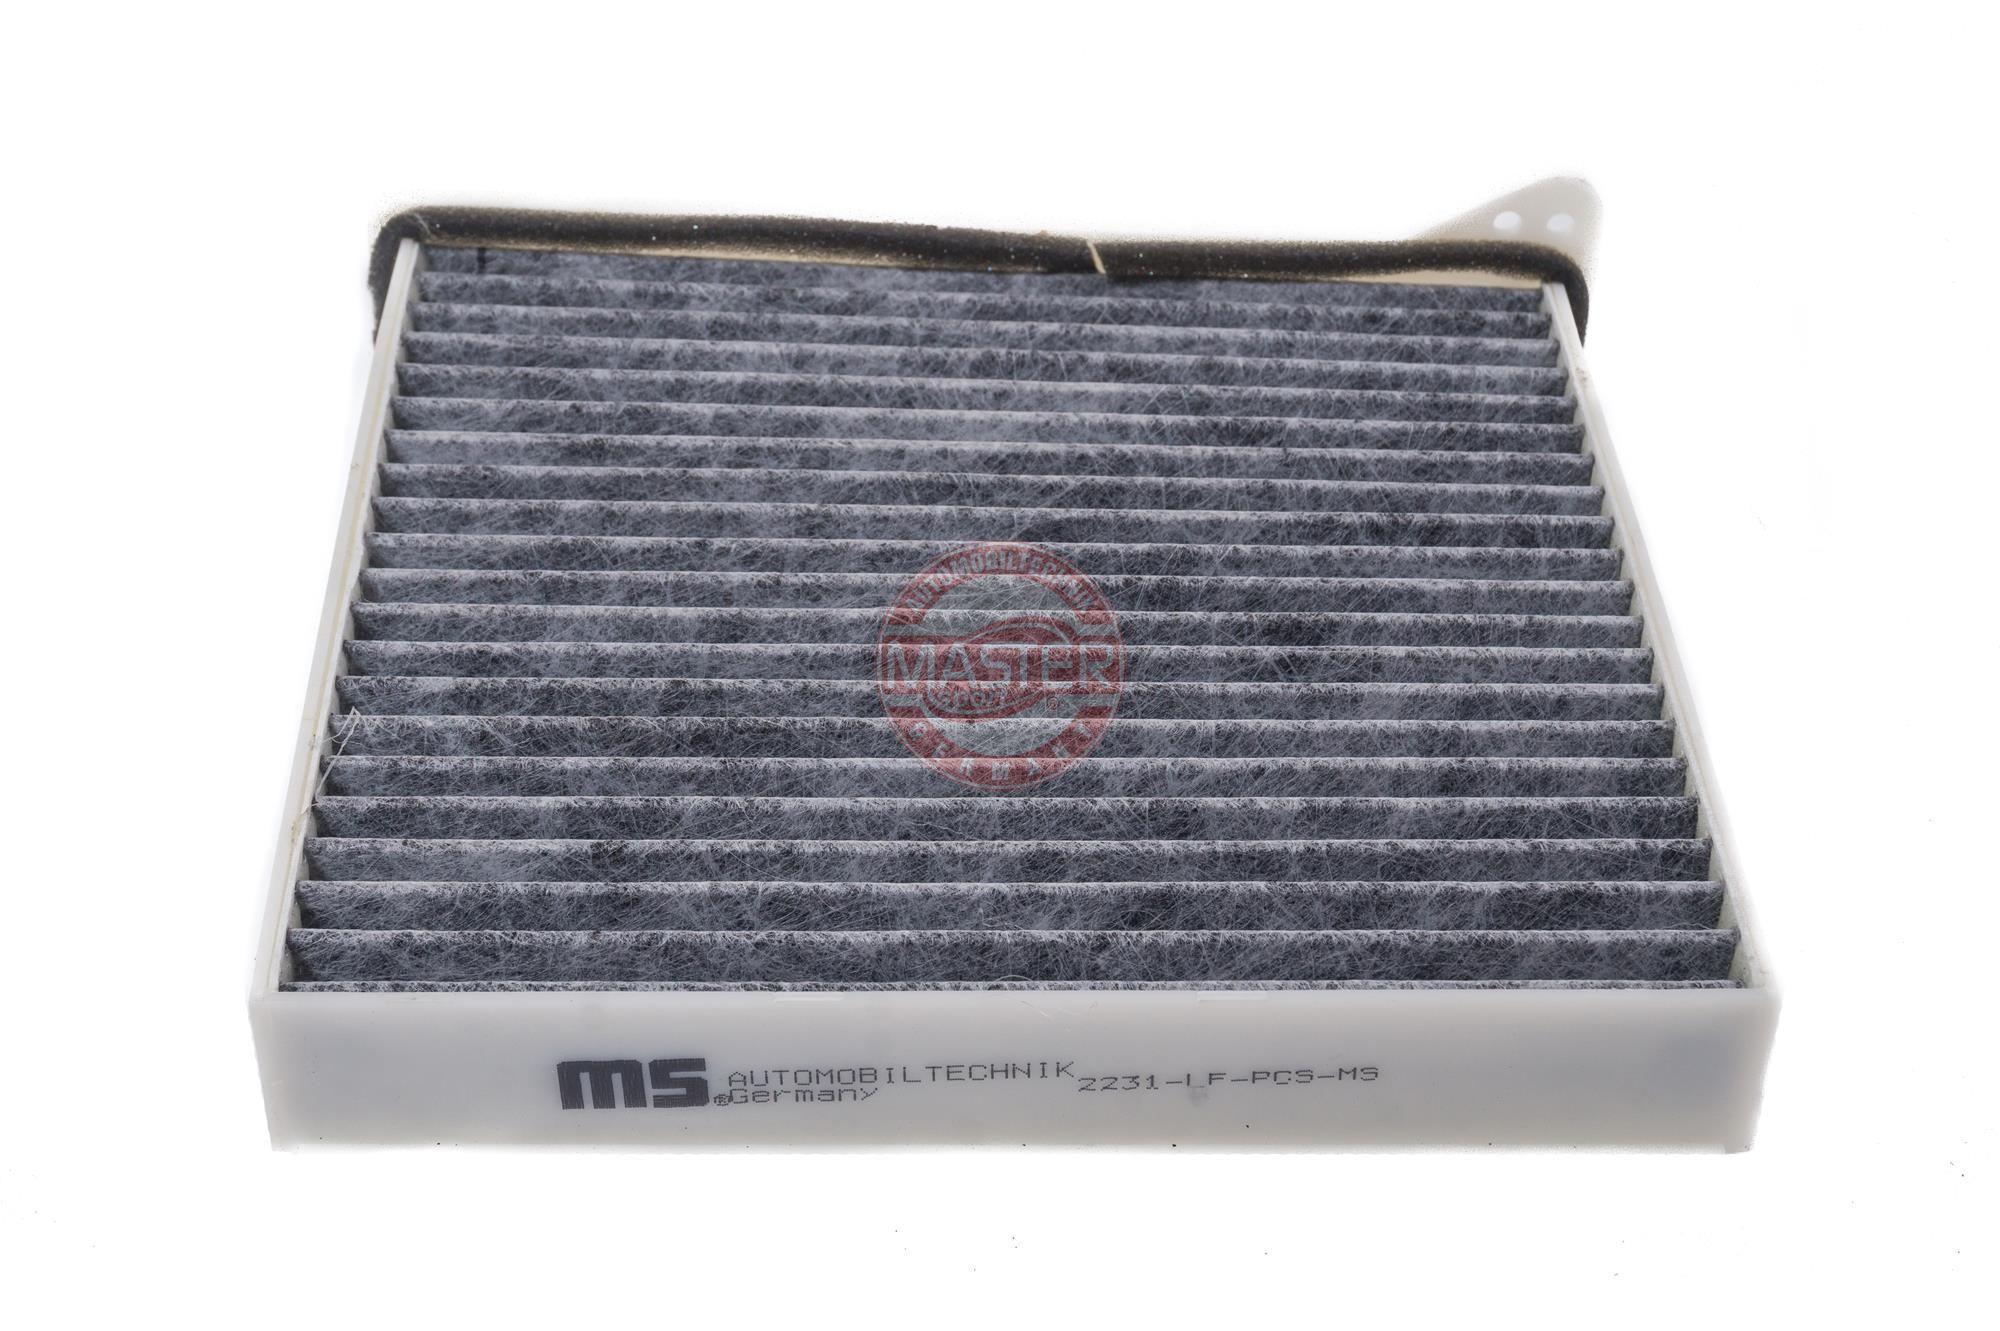 Innenraumfilter 2231-IF-PCS-MS MASTER-SPORT 420022310 in Original Qualität